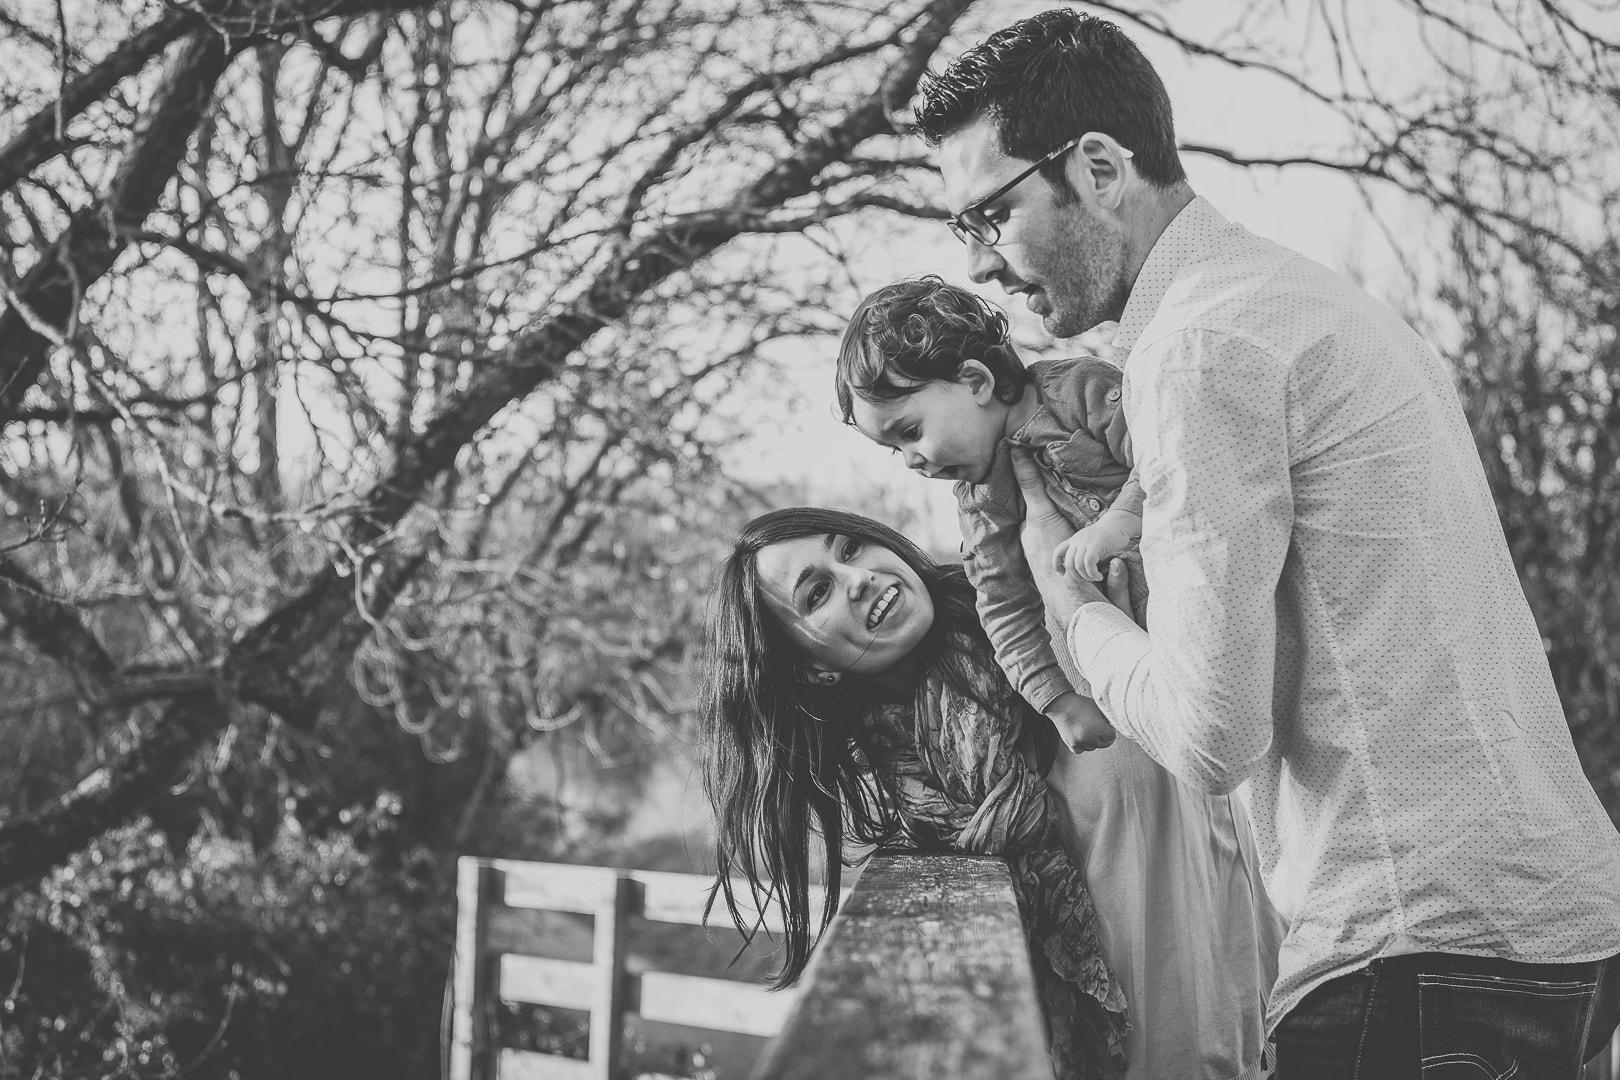 trezors-photography-photographe-professionnel-toulouse-31-enfance-seance-famille-lifestyle (11)